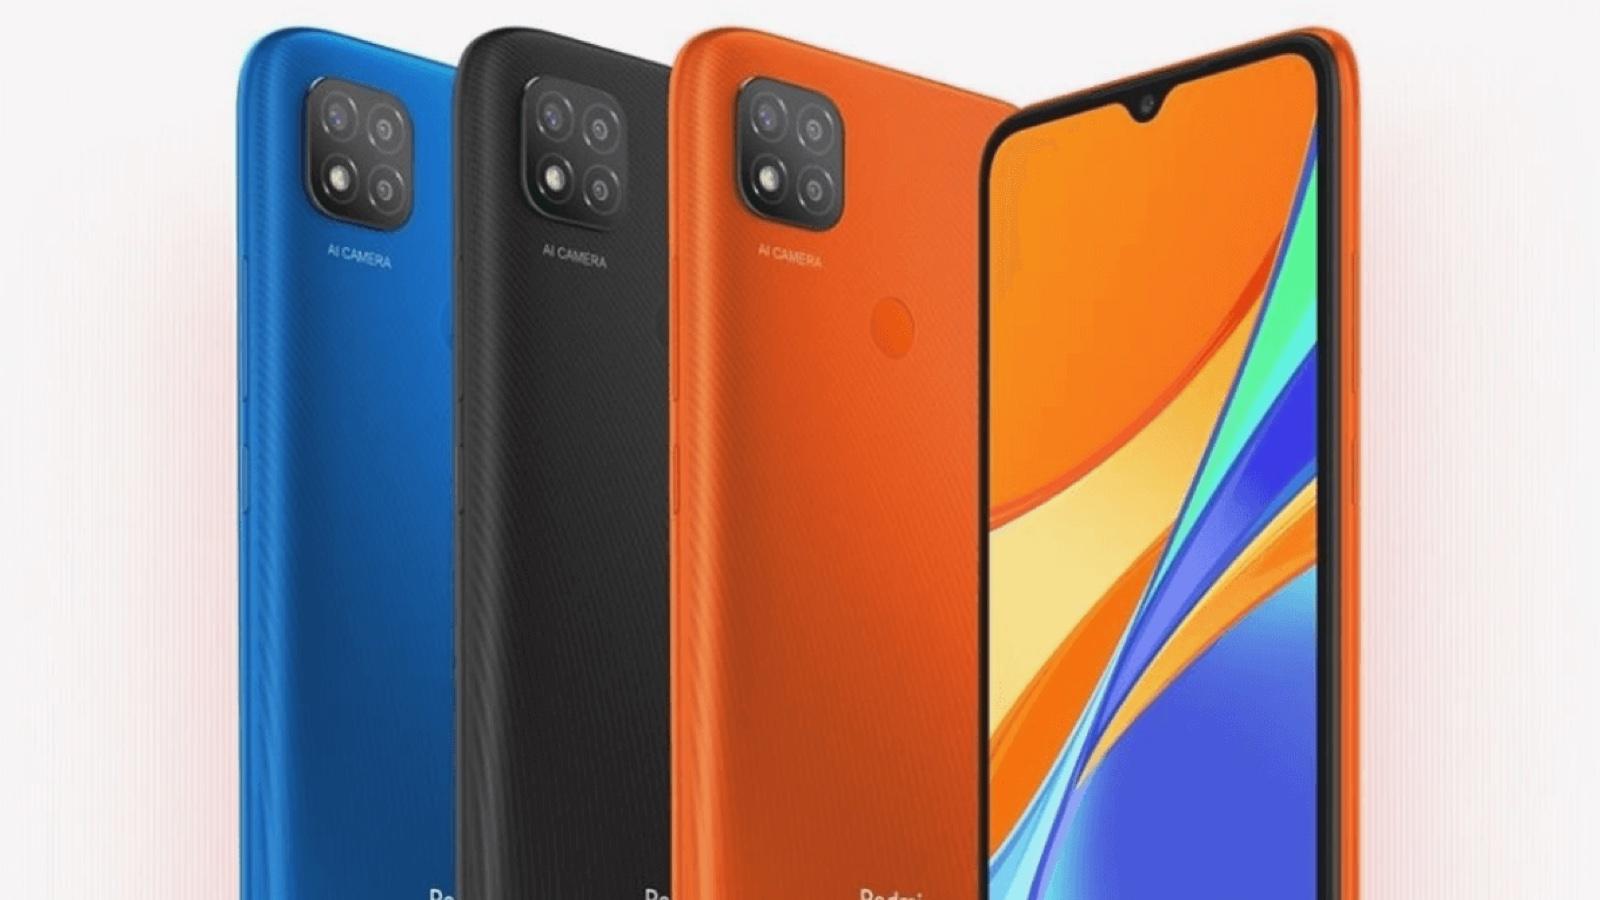 Xiaomi Redmi 9C 3GB + 64GB Smartphone Offered for $99.00